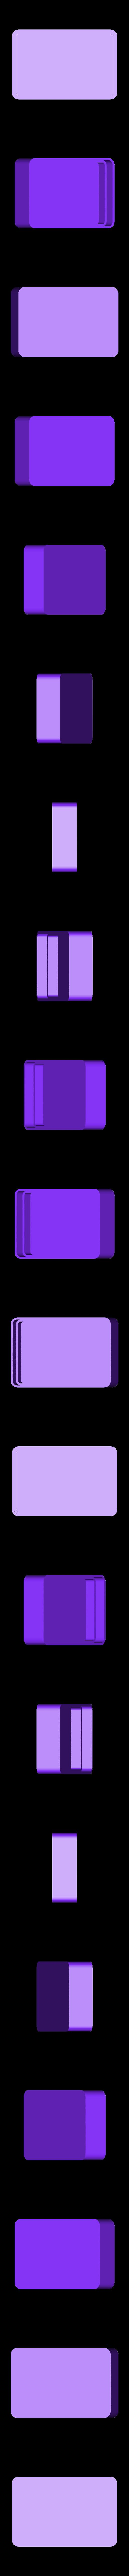 Holder.stl Download free STL file Soap / Scoring Pad Holder • 3D printer design, victor_arnaiz